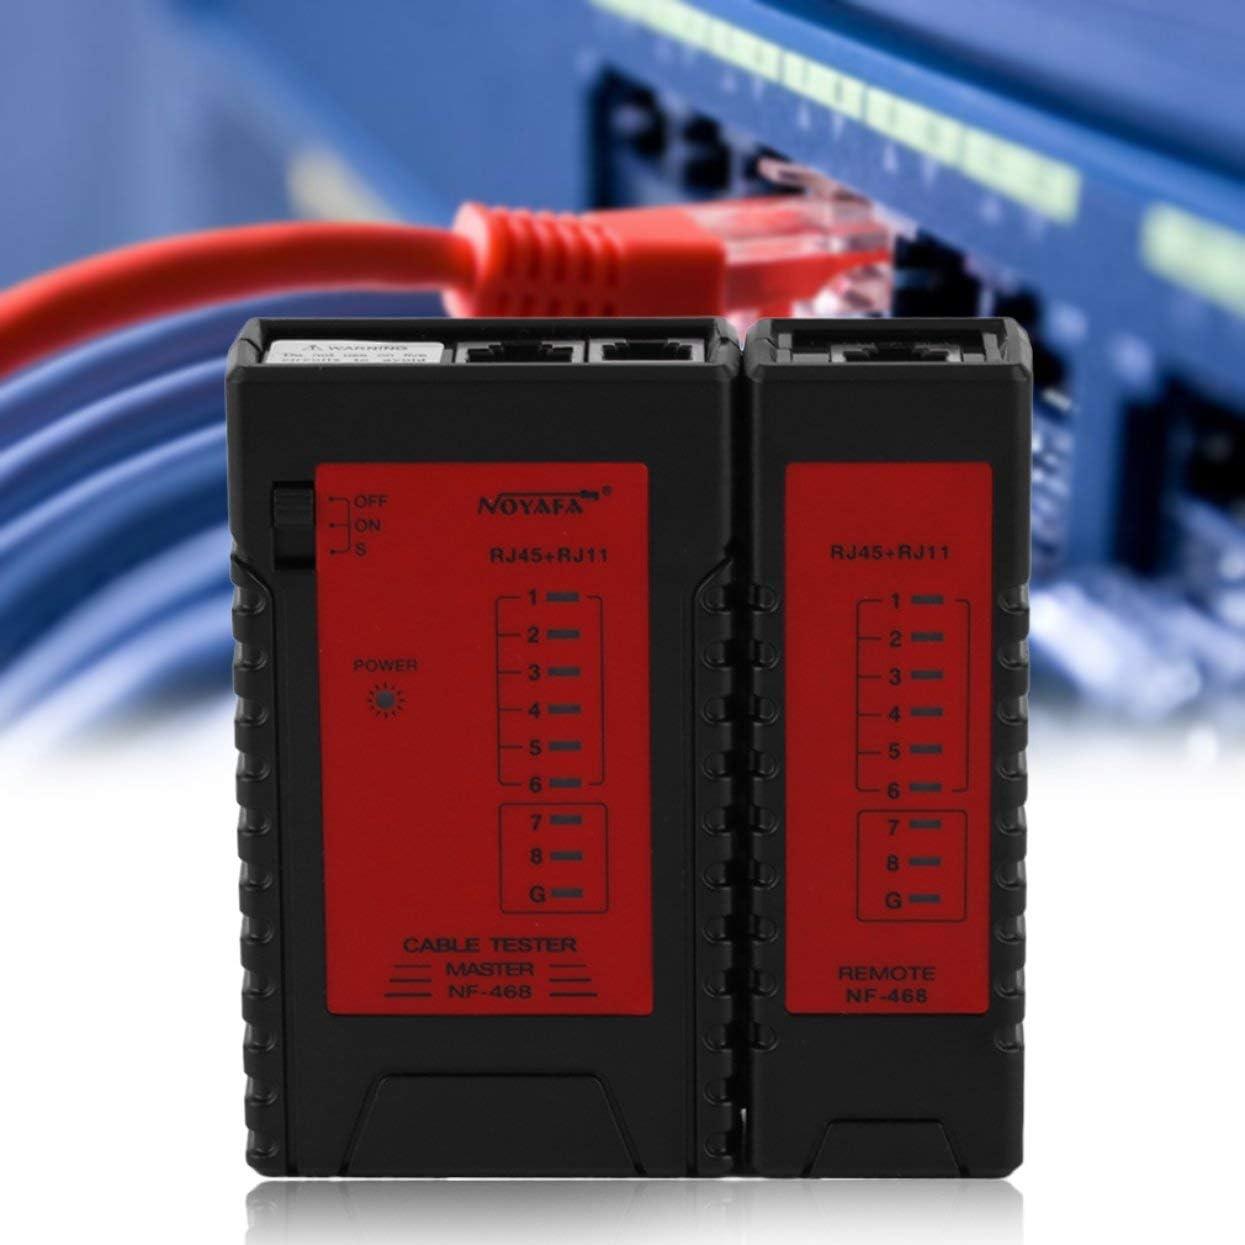 Tree-on-Life Tester on-off Via Cavo Ethernet Professionale NF-468 RJ45 RJ11 RJ12 LAN Cable Line Tester Test di Rete Strumenti Verifica